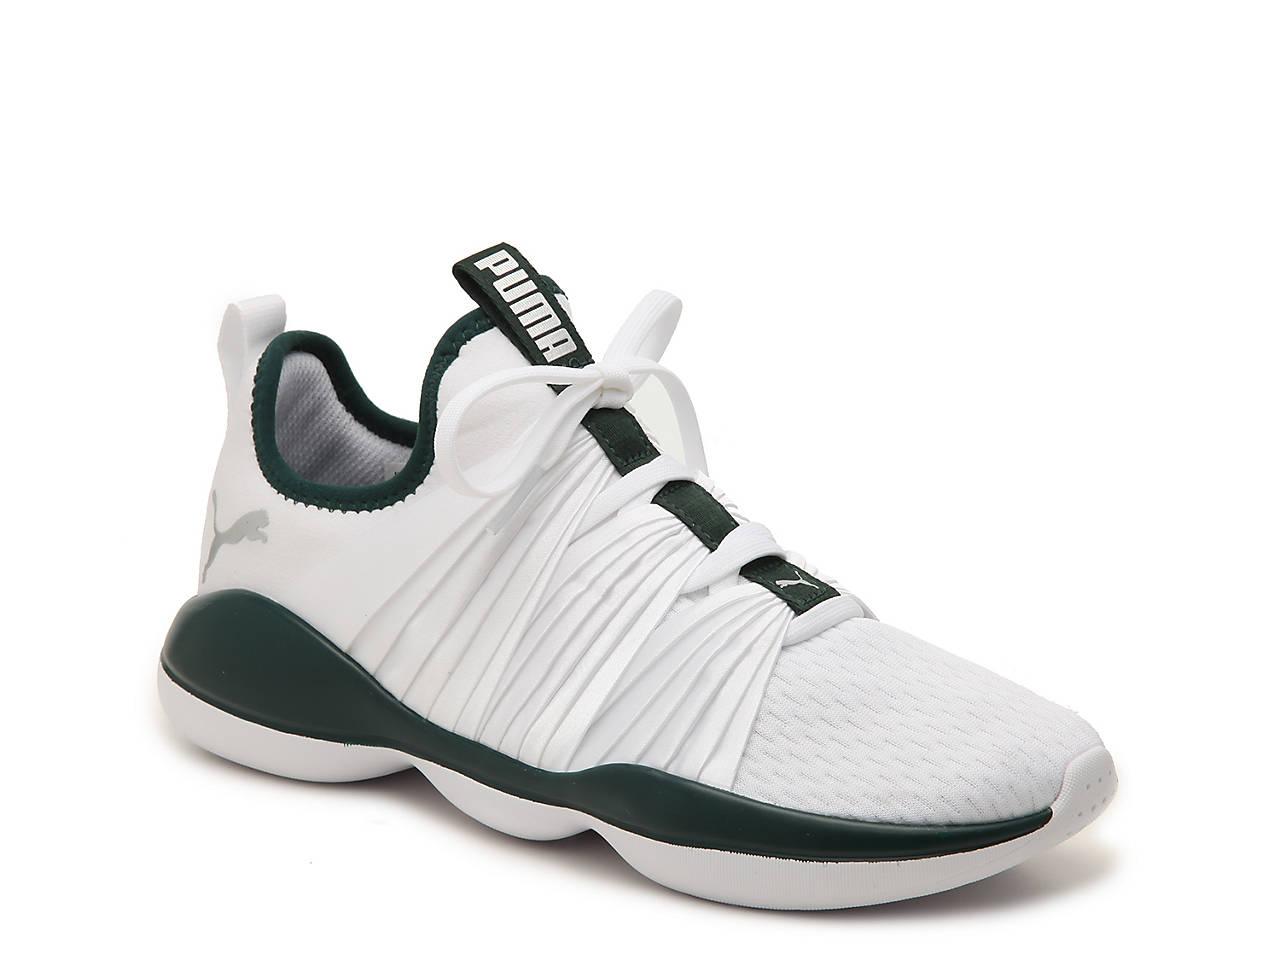 0d9645289ed Puma Flourish Lightweight Training Shoe - Women's Women's Shoes | DSW